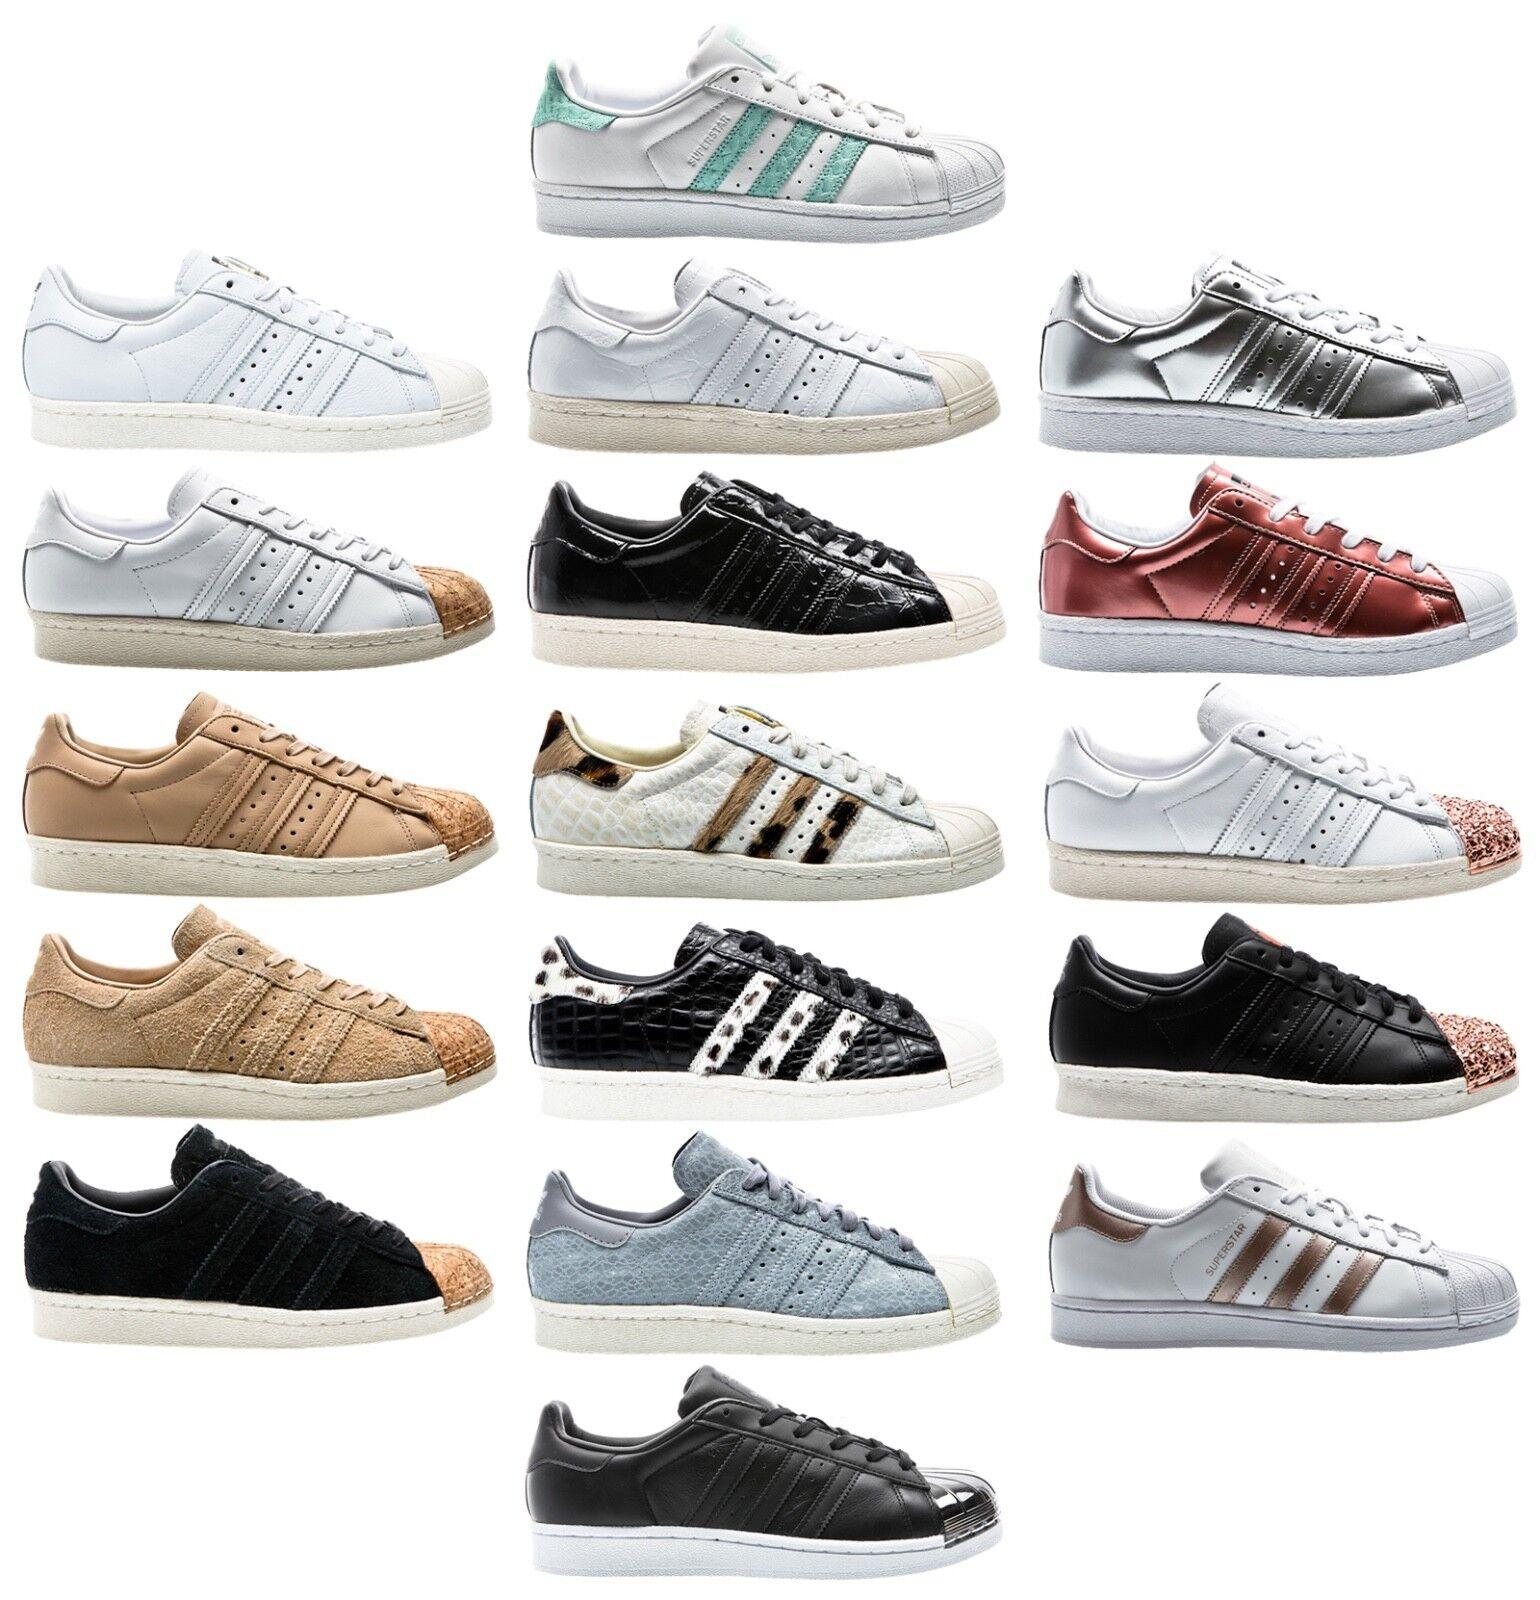 Adidas Superstar W 80s Rt Foundation Animal Ladies Shoes Women Sneaker